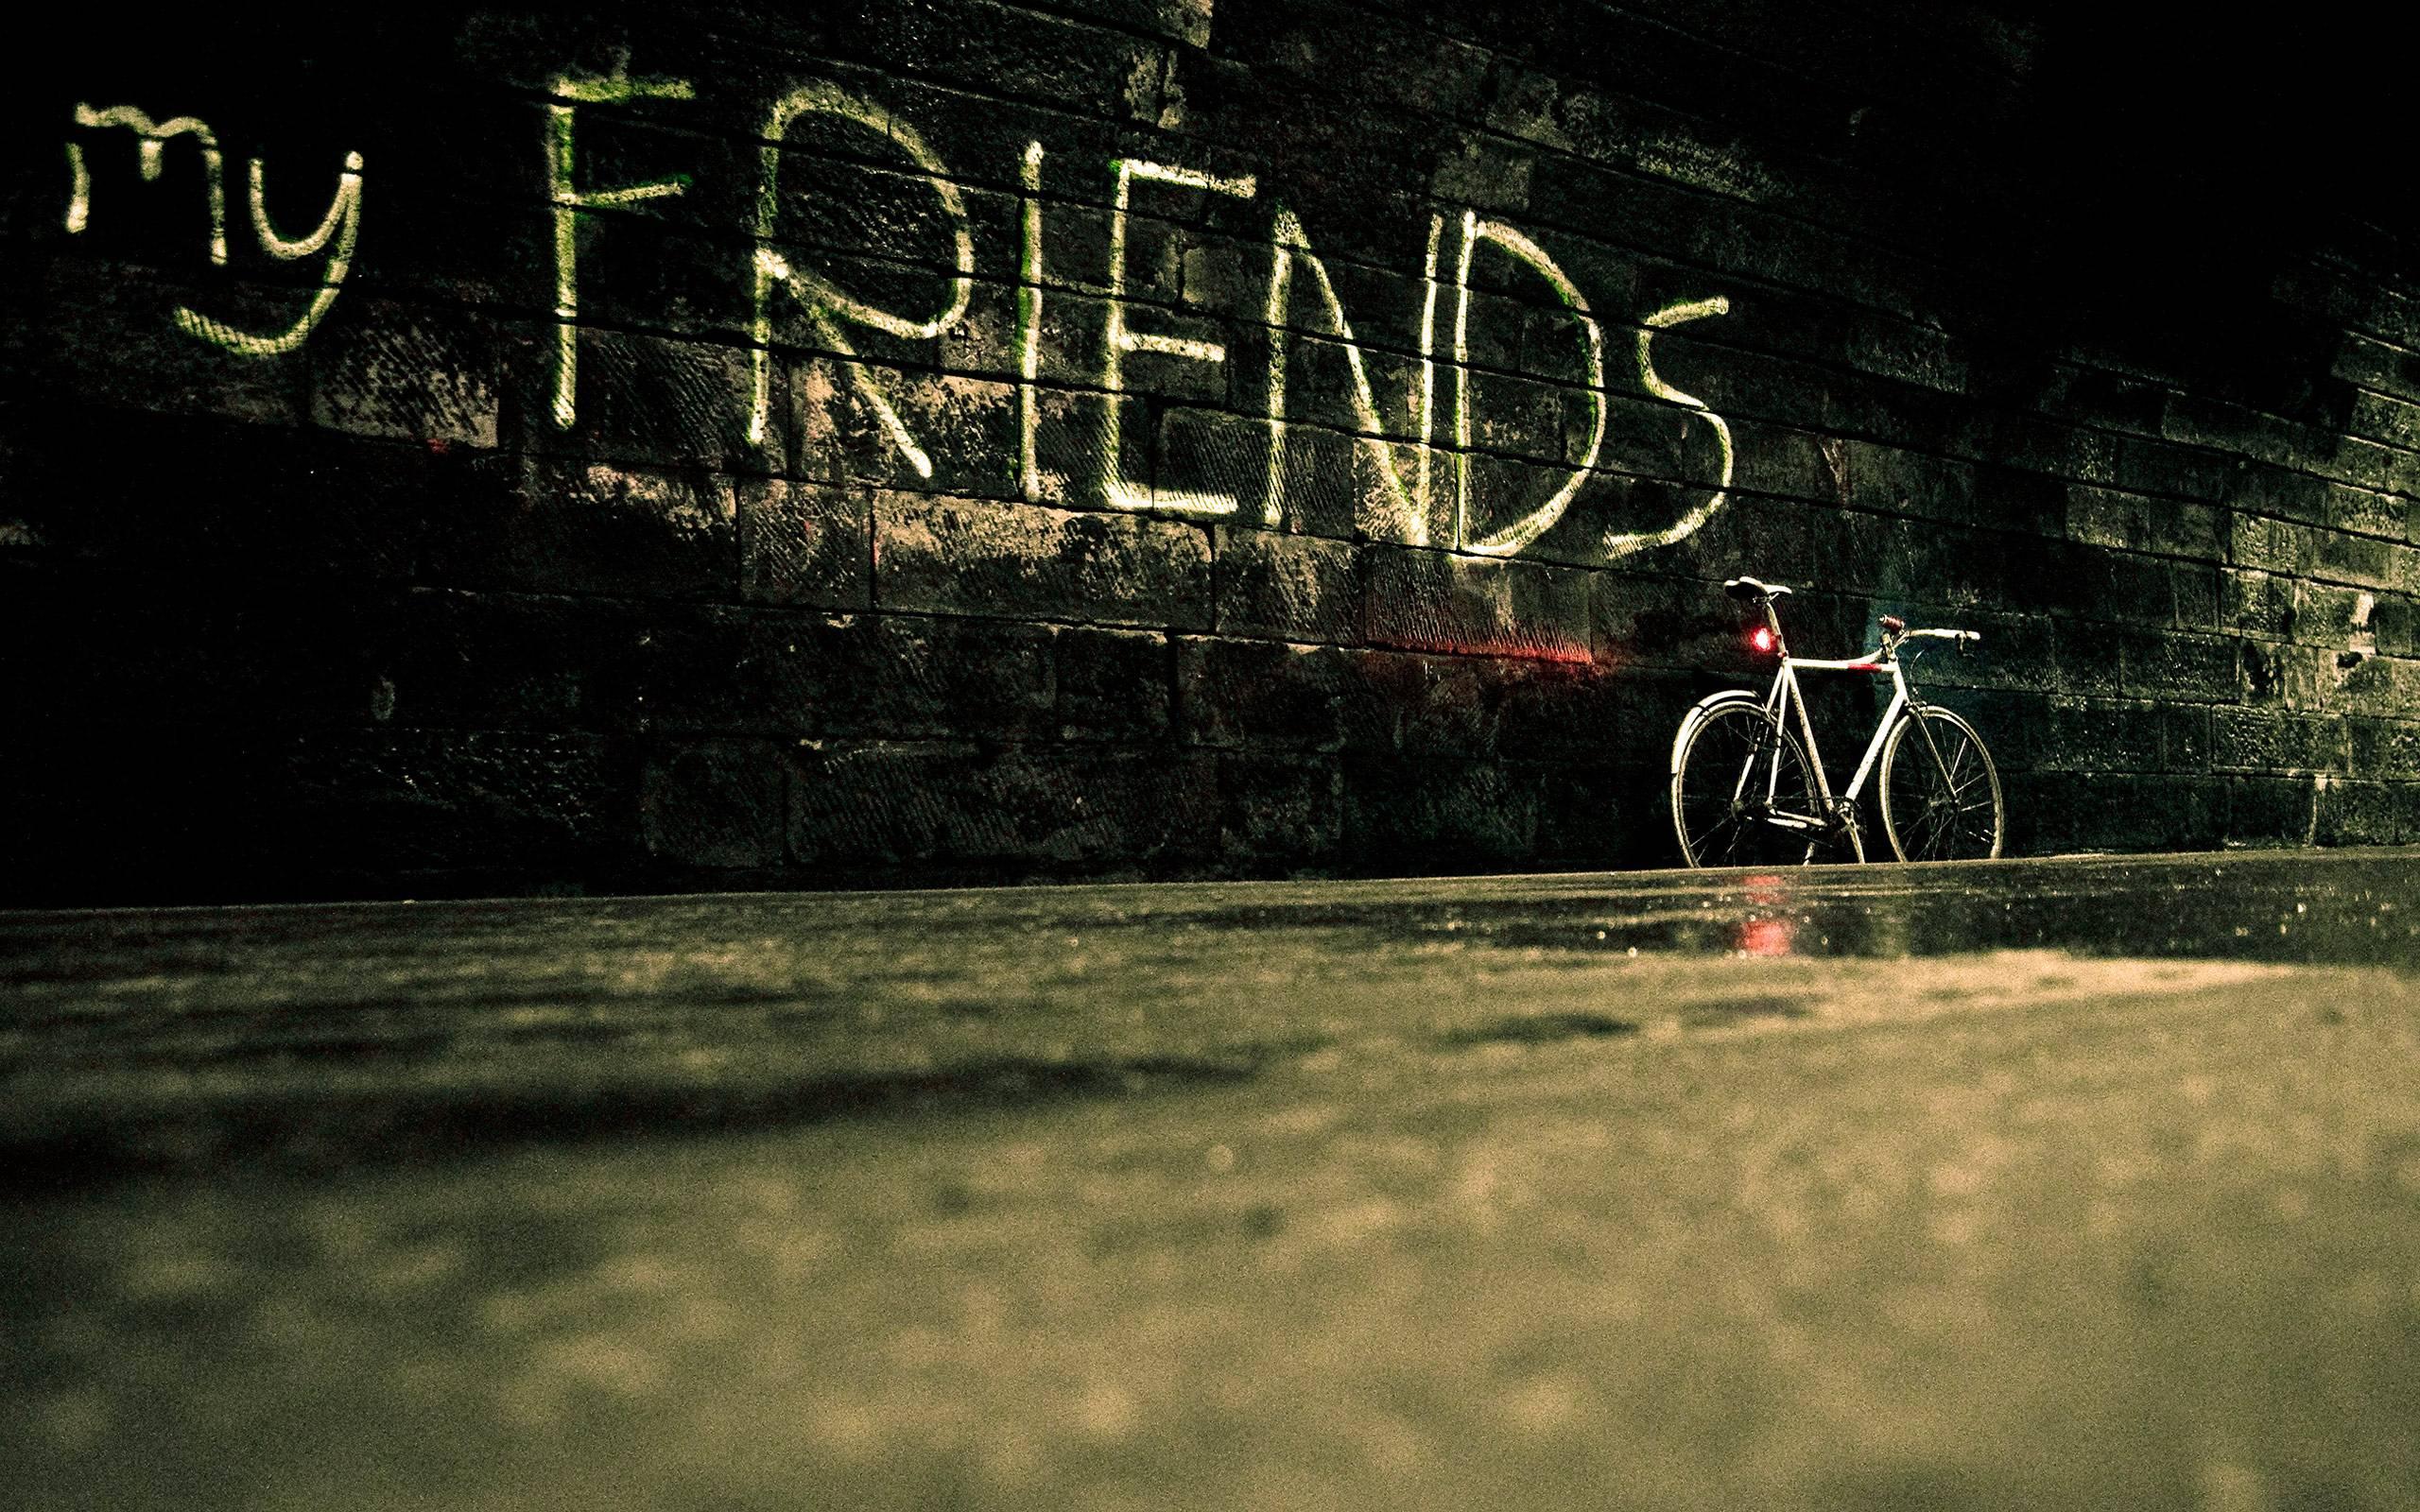 best friends wallpapers wallpaper cave